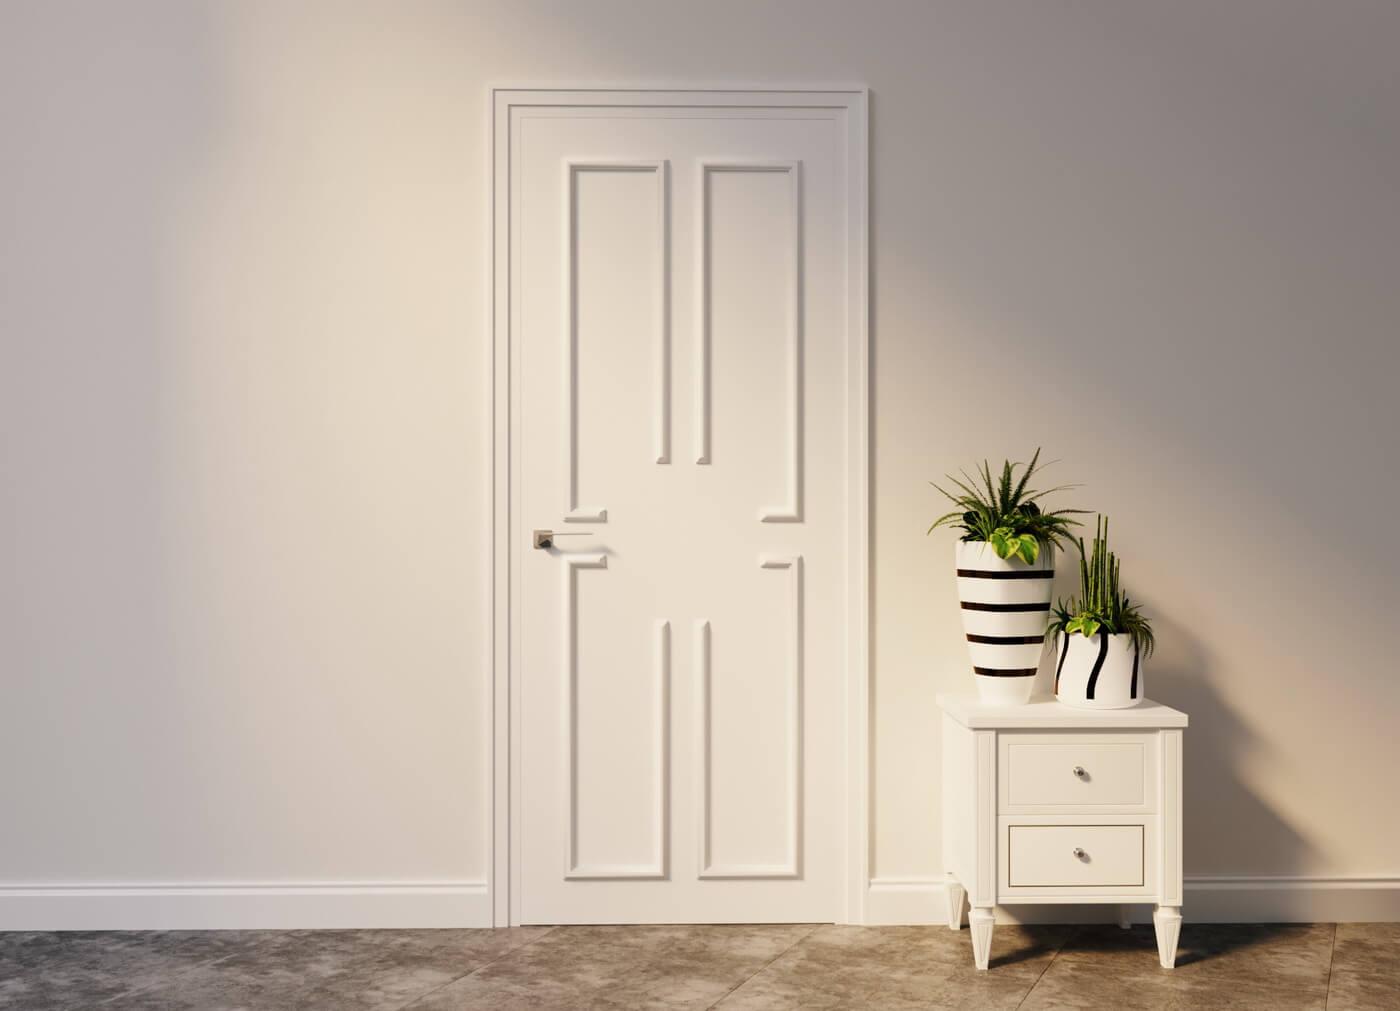 Предметный дизайн_Дверь NewClass 5_1